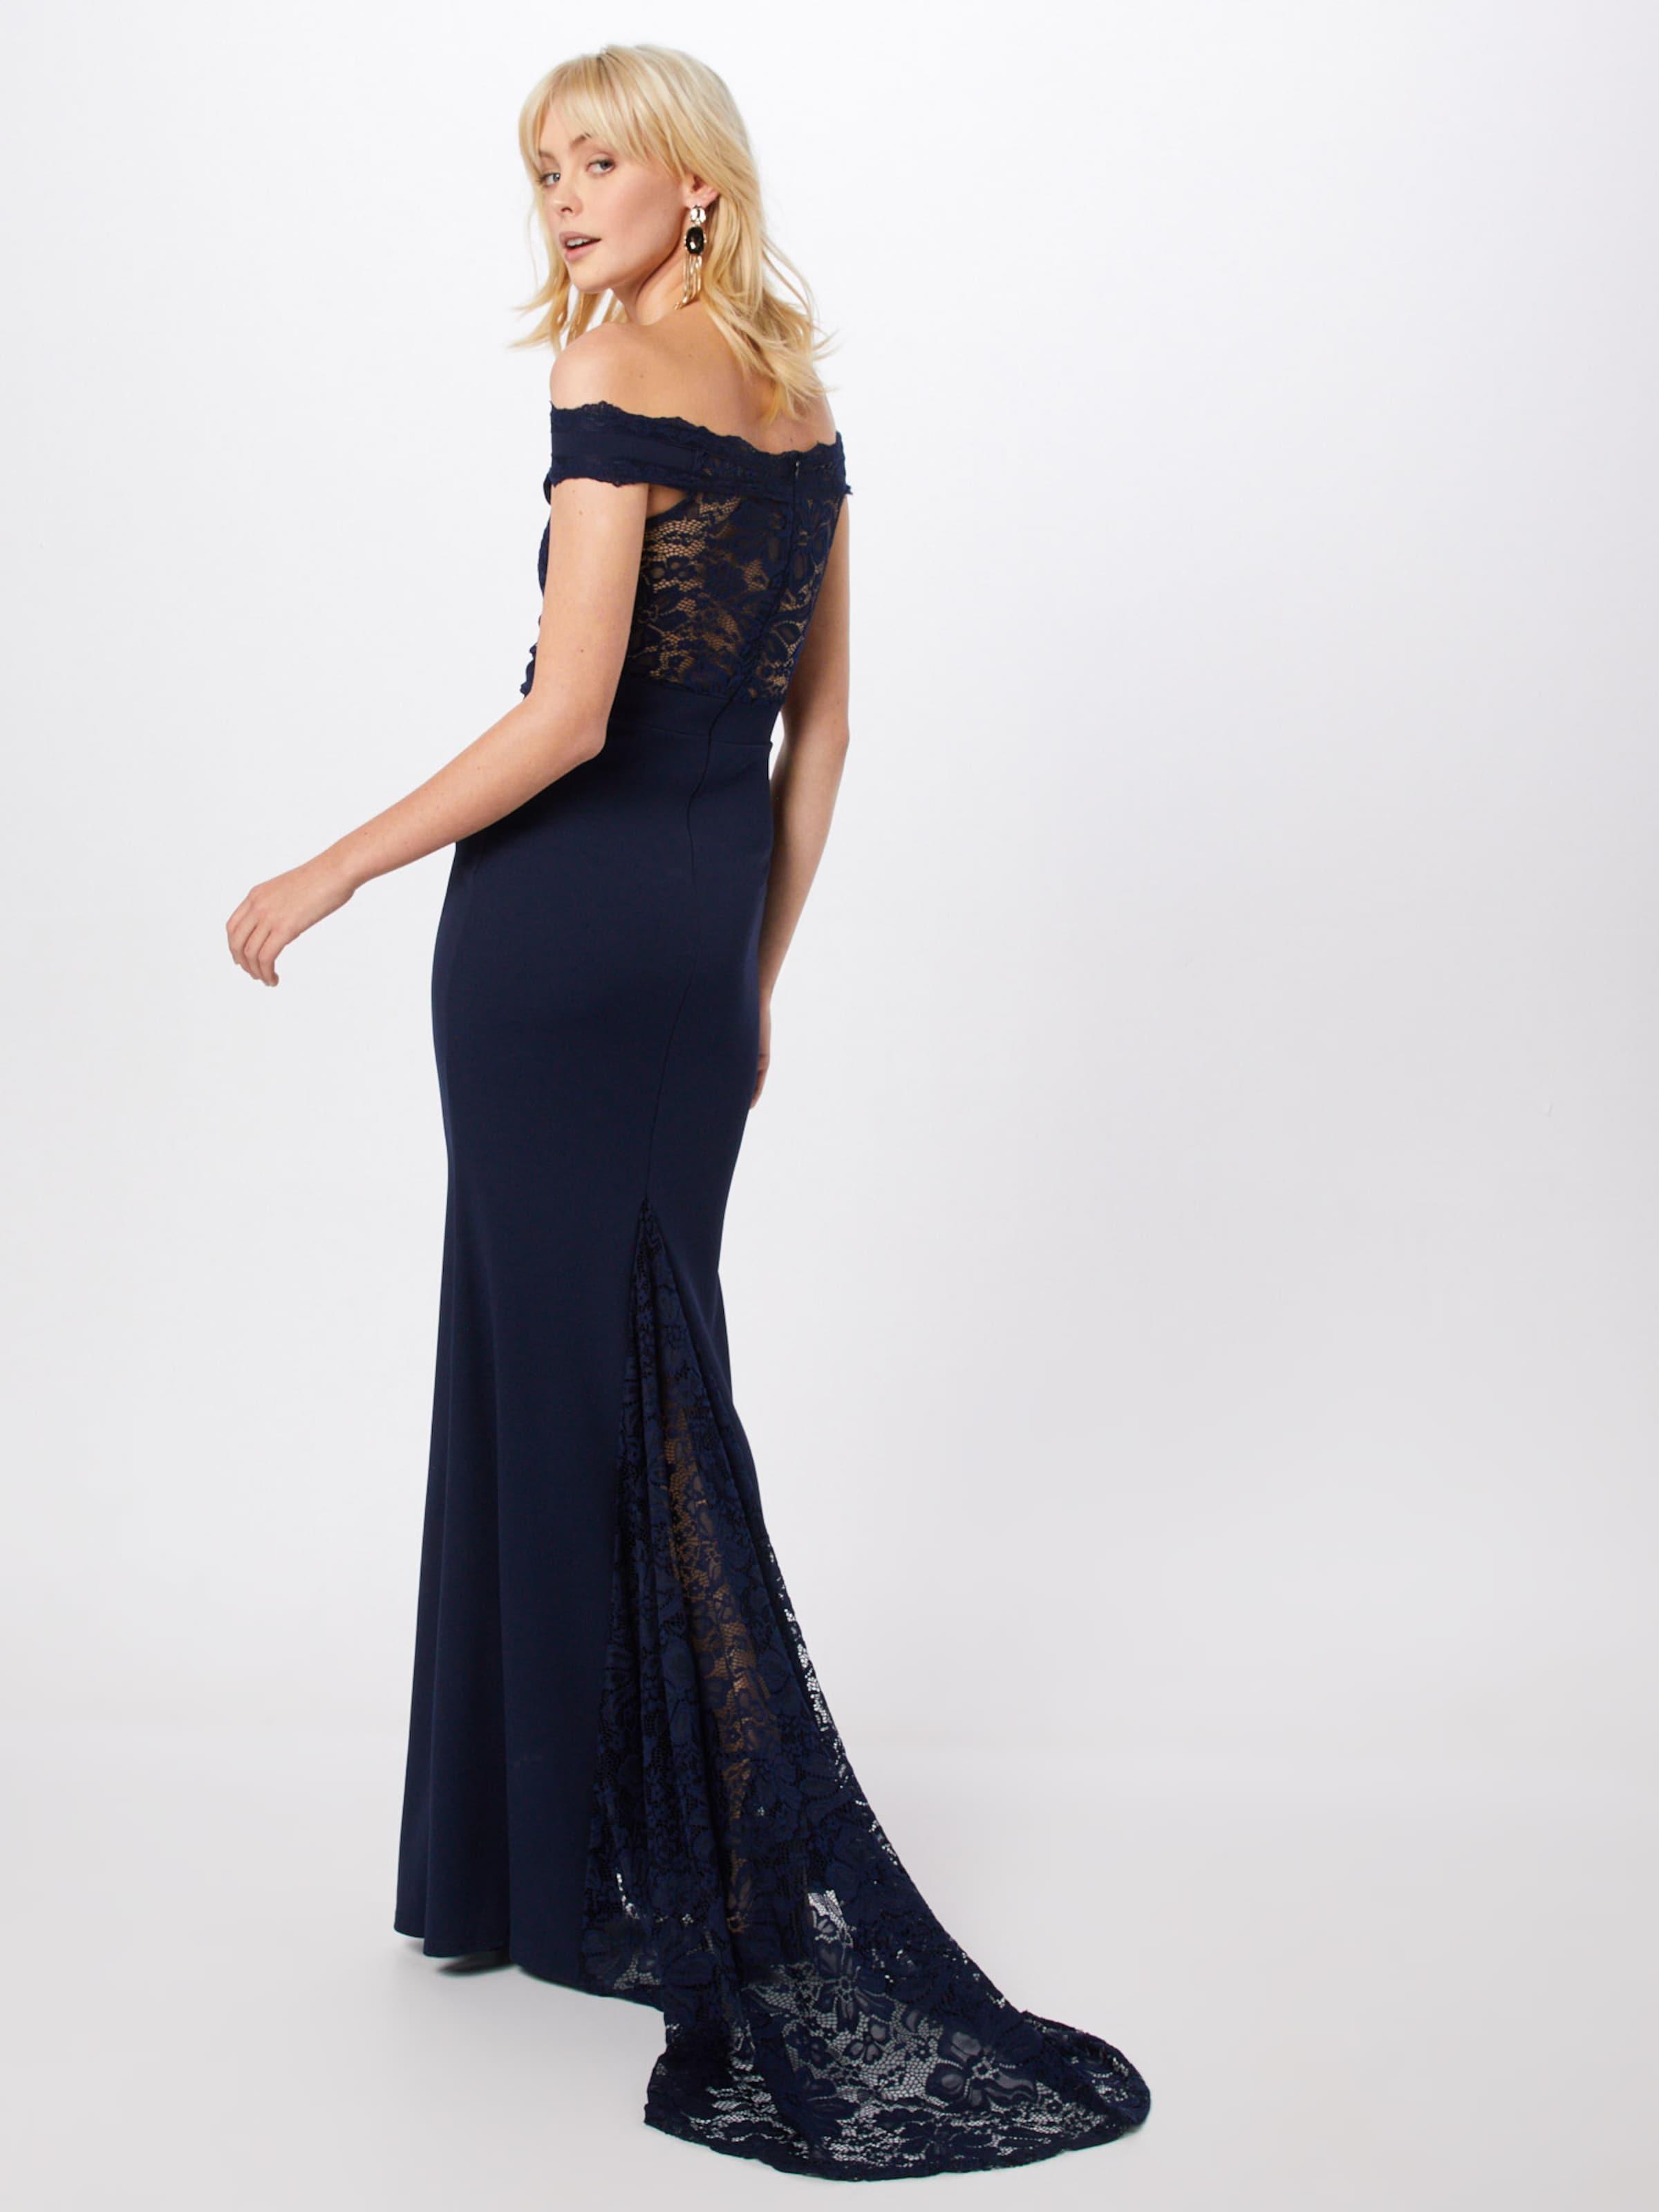 Missguided Bleu De Soirée Maxi' Bardot En Lace Fishtail Marine Robe 'bridesmaid 0Nw8nm